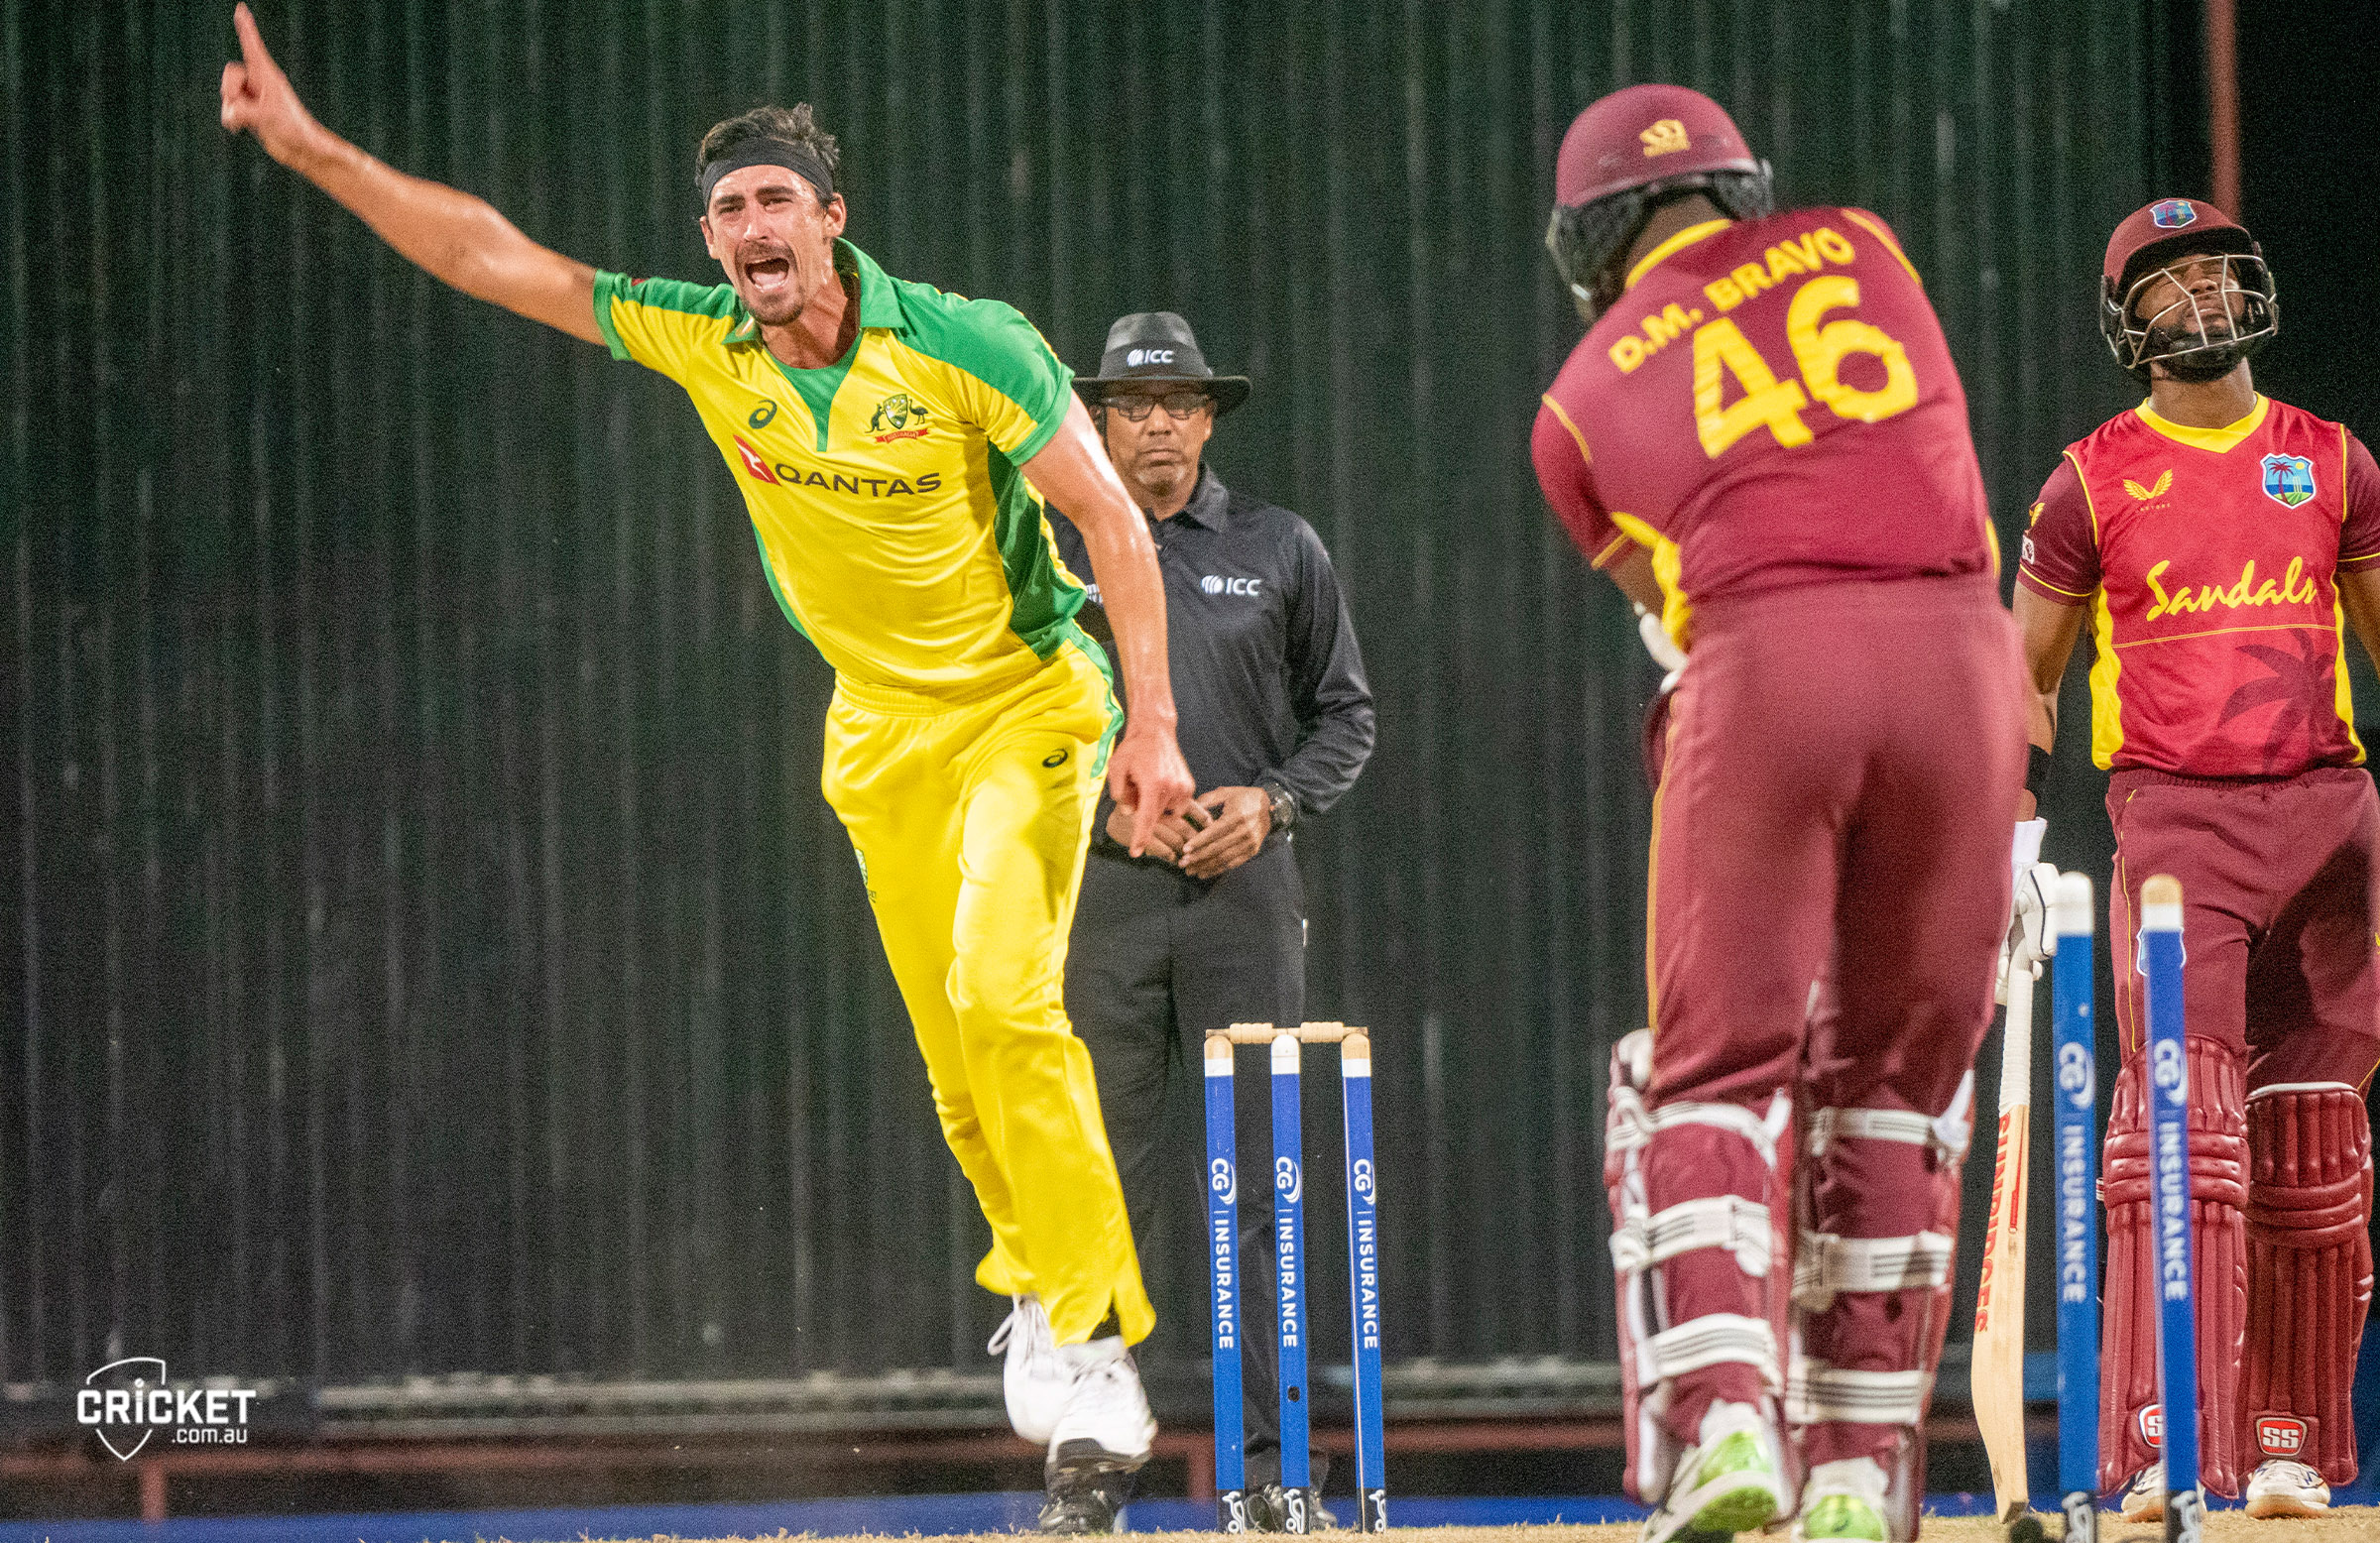 Starc celebrates the wicket of Darren Bravo // cricket.com.au